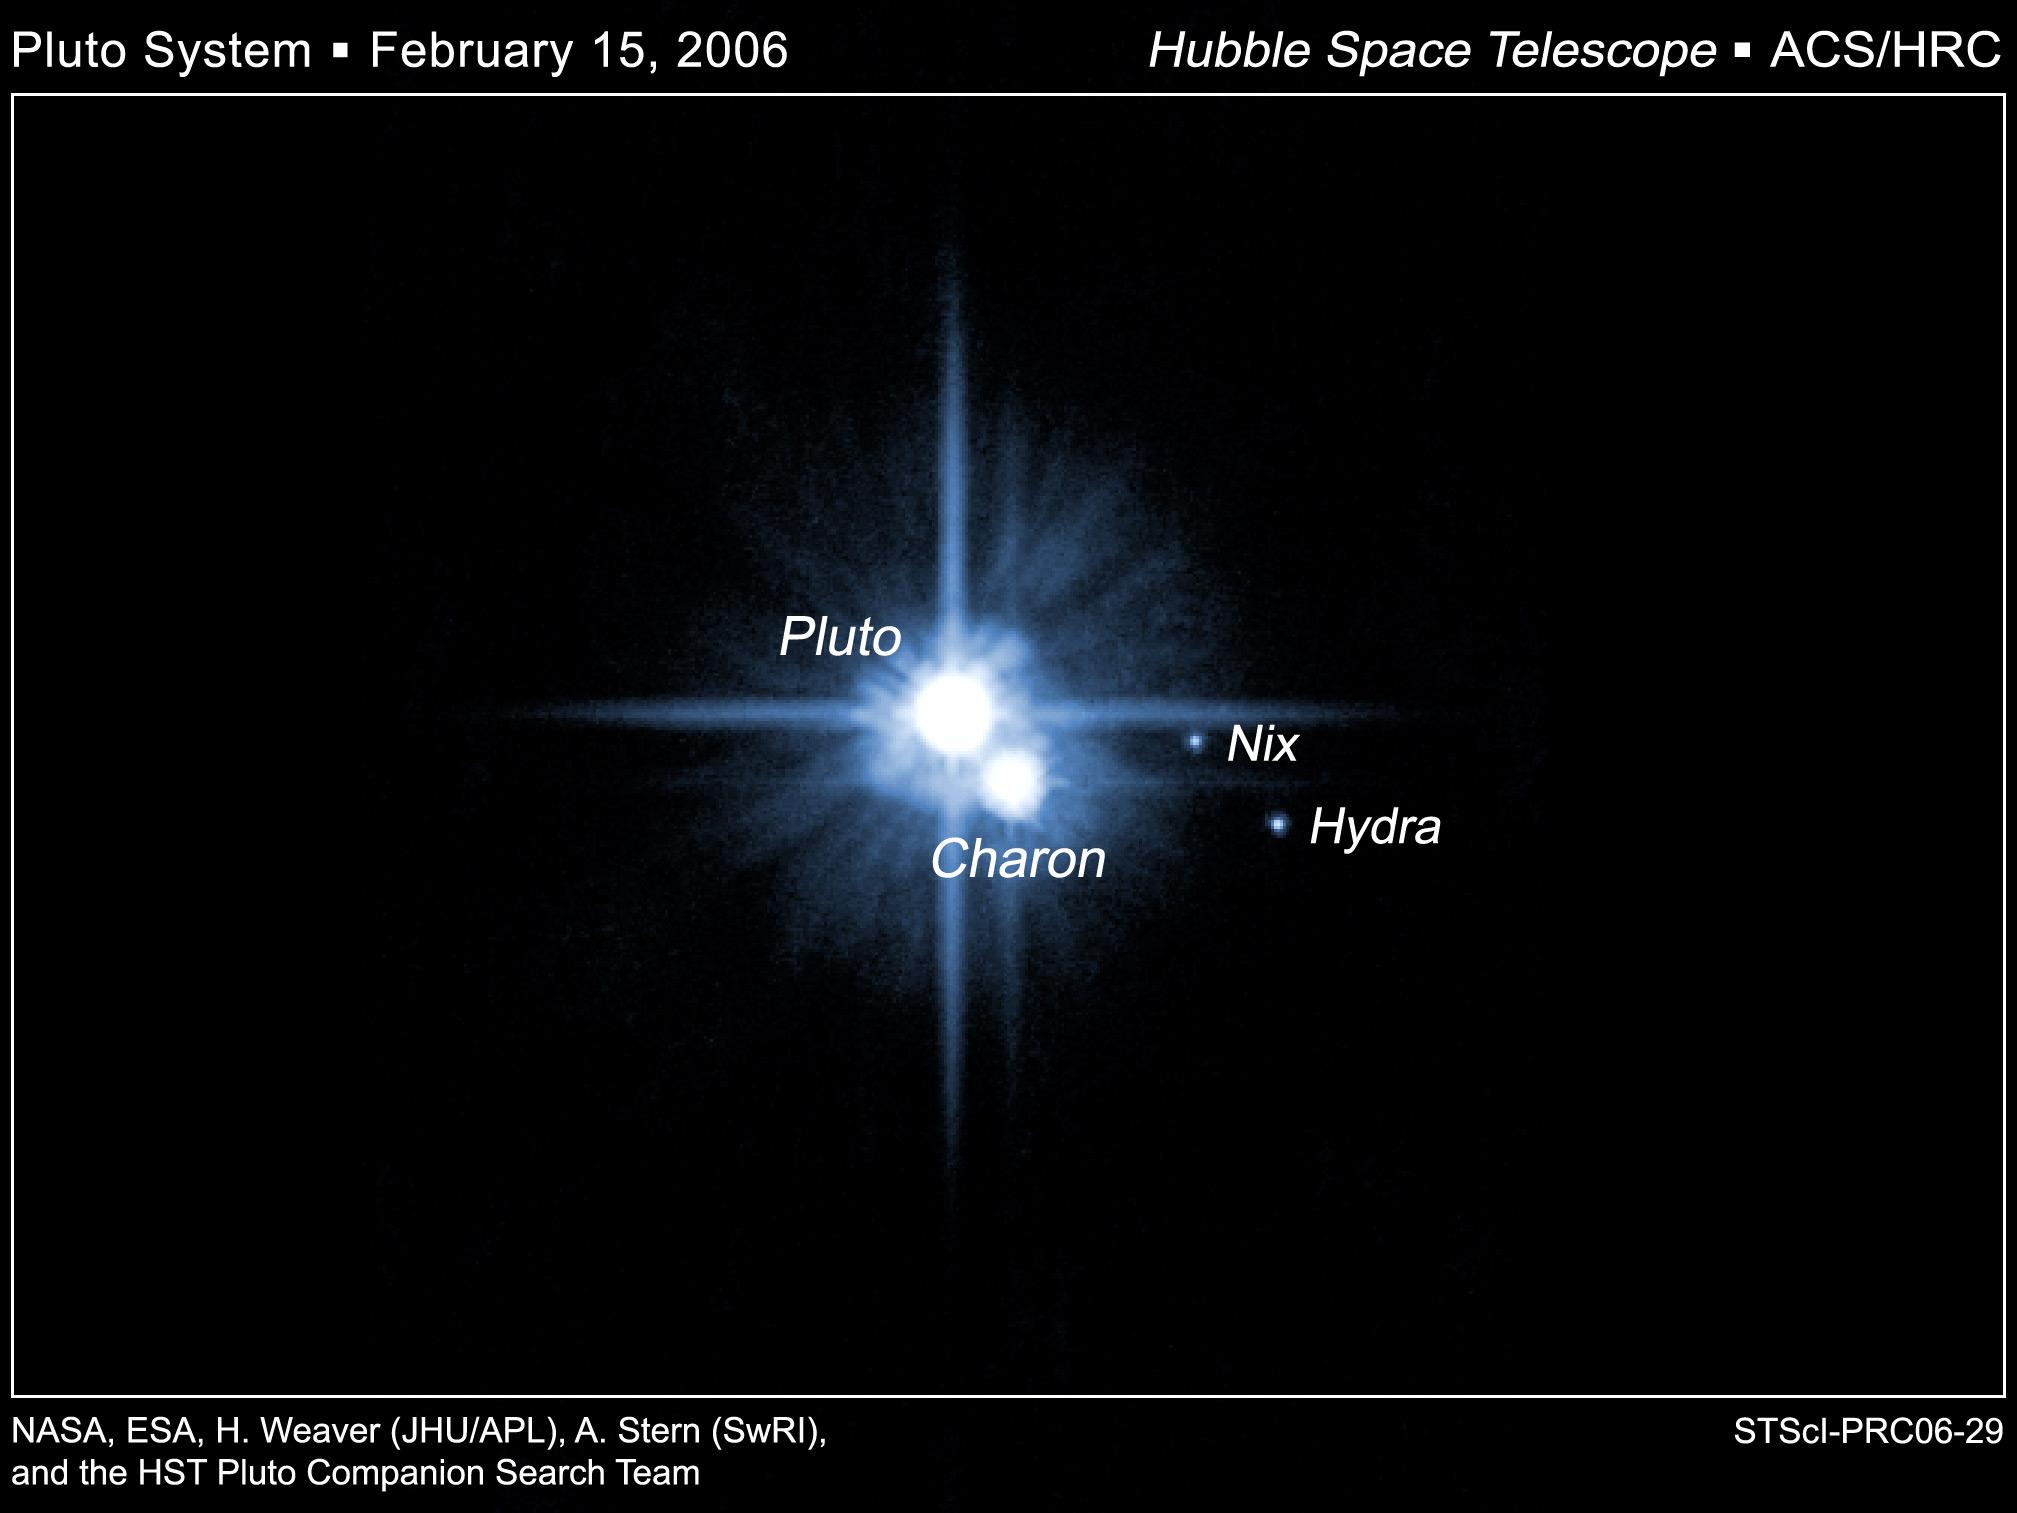 pluto's moons nix and hydra - HD2017×1513